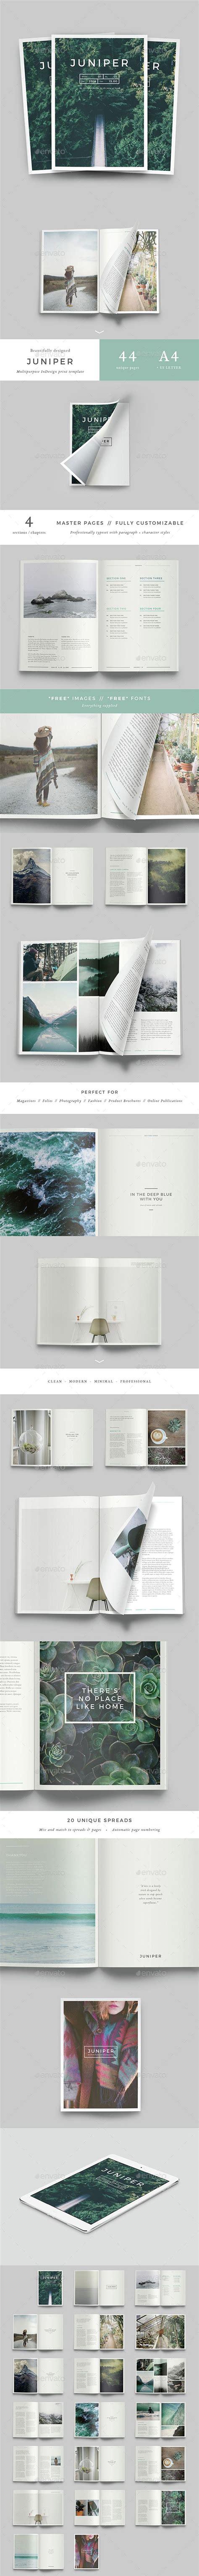 print portfolio template 25 best ideas about printed portfolio on